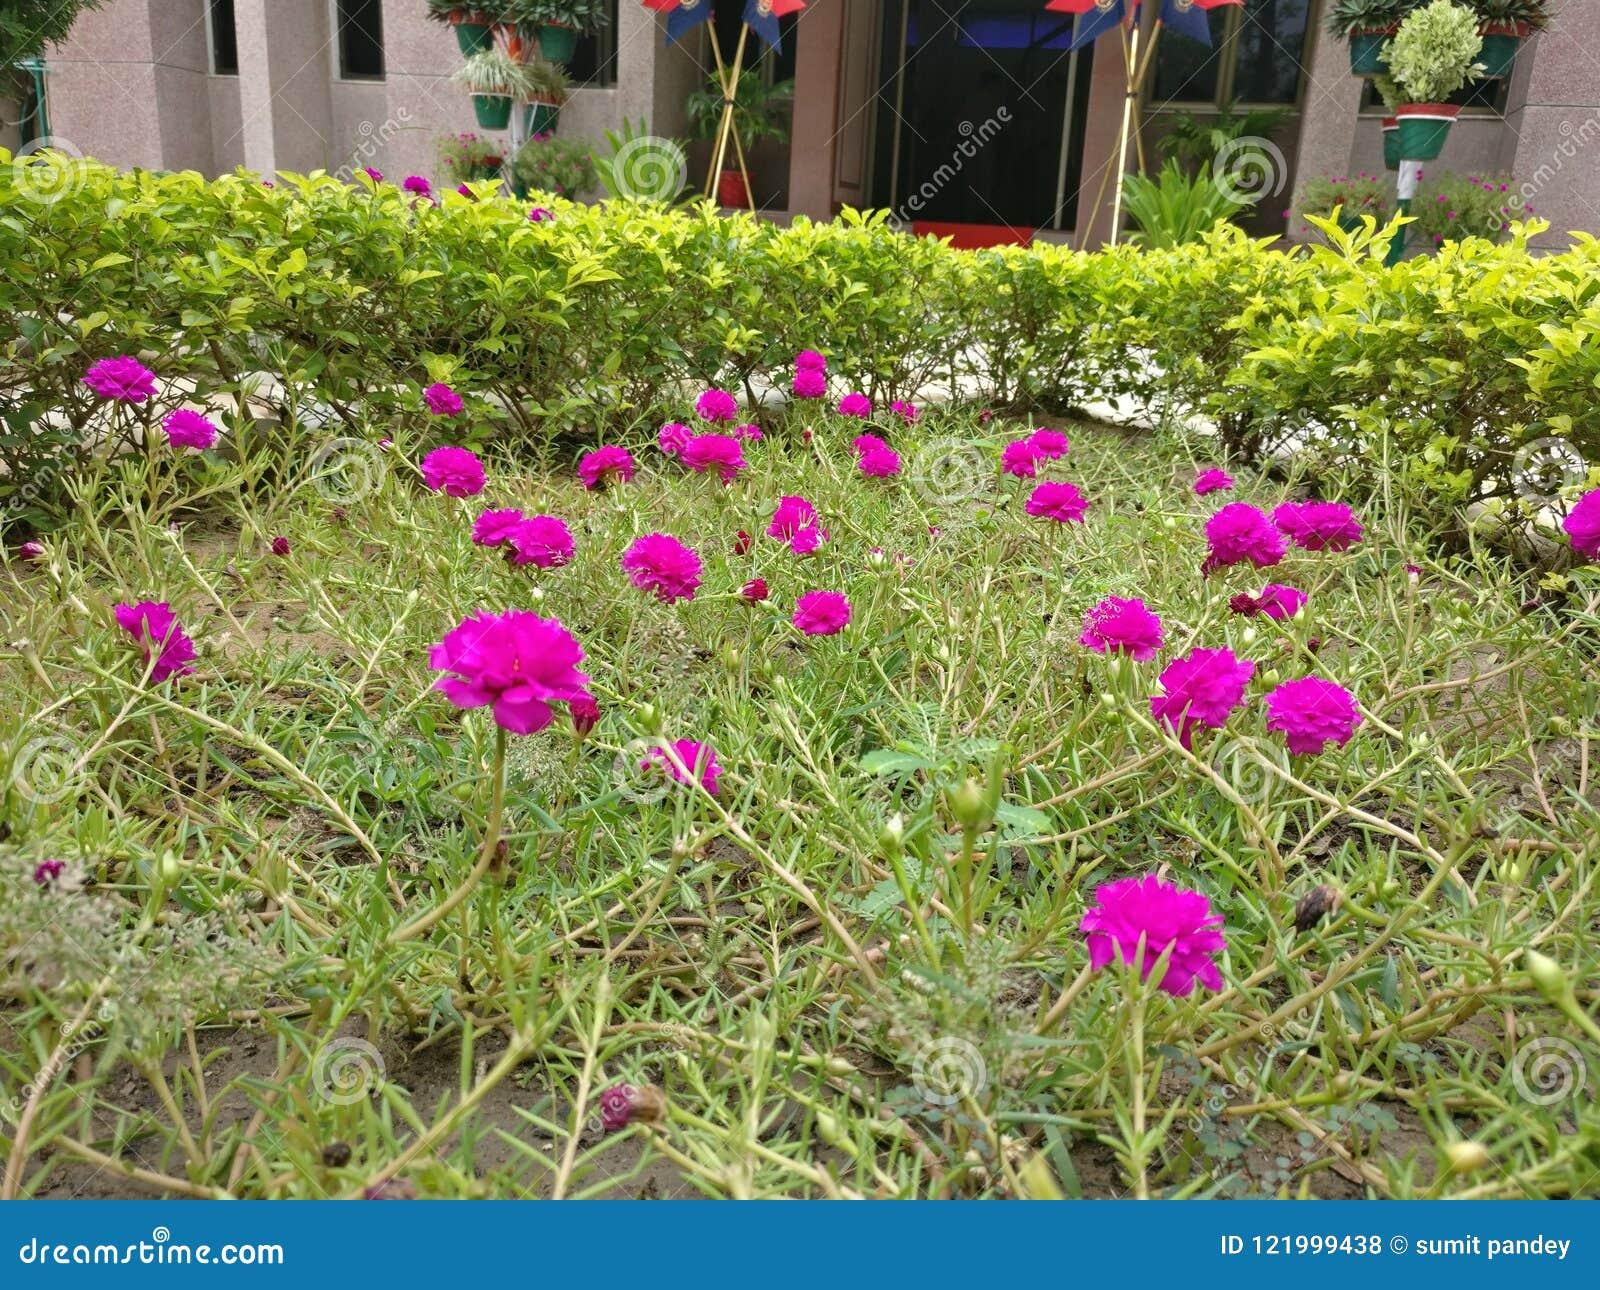 Small flowers beauty stock photo image of beautiful 121999438 download small flowers beauty stock photo image of beautiful 121999438 izmirmasajfo